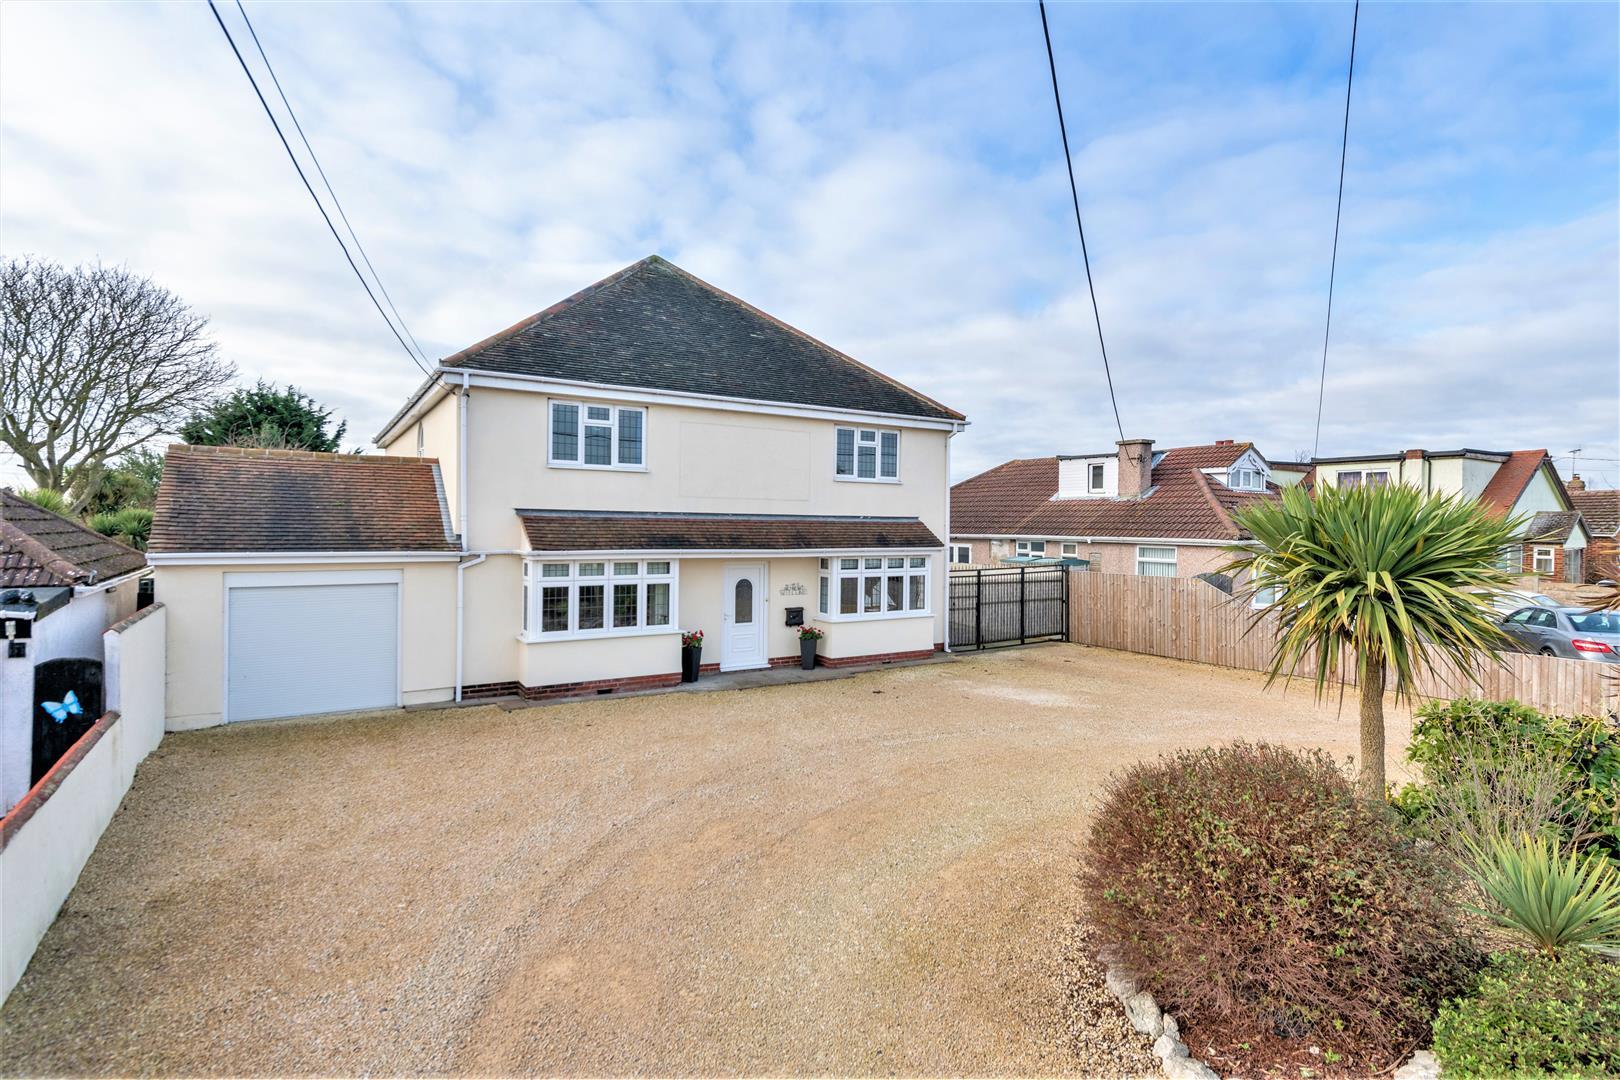 Jaywick Lane, Clacton-On-Sea, Essex, CO16 8BB